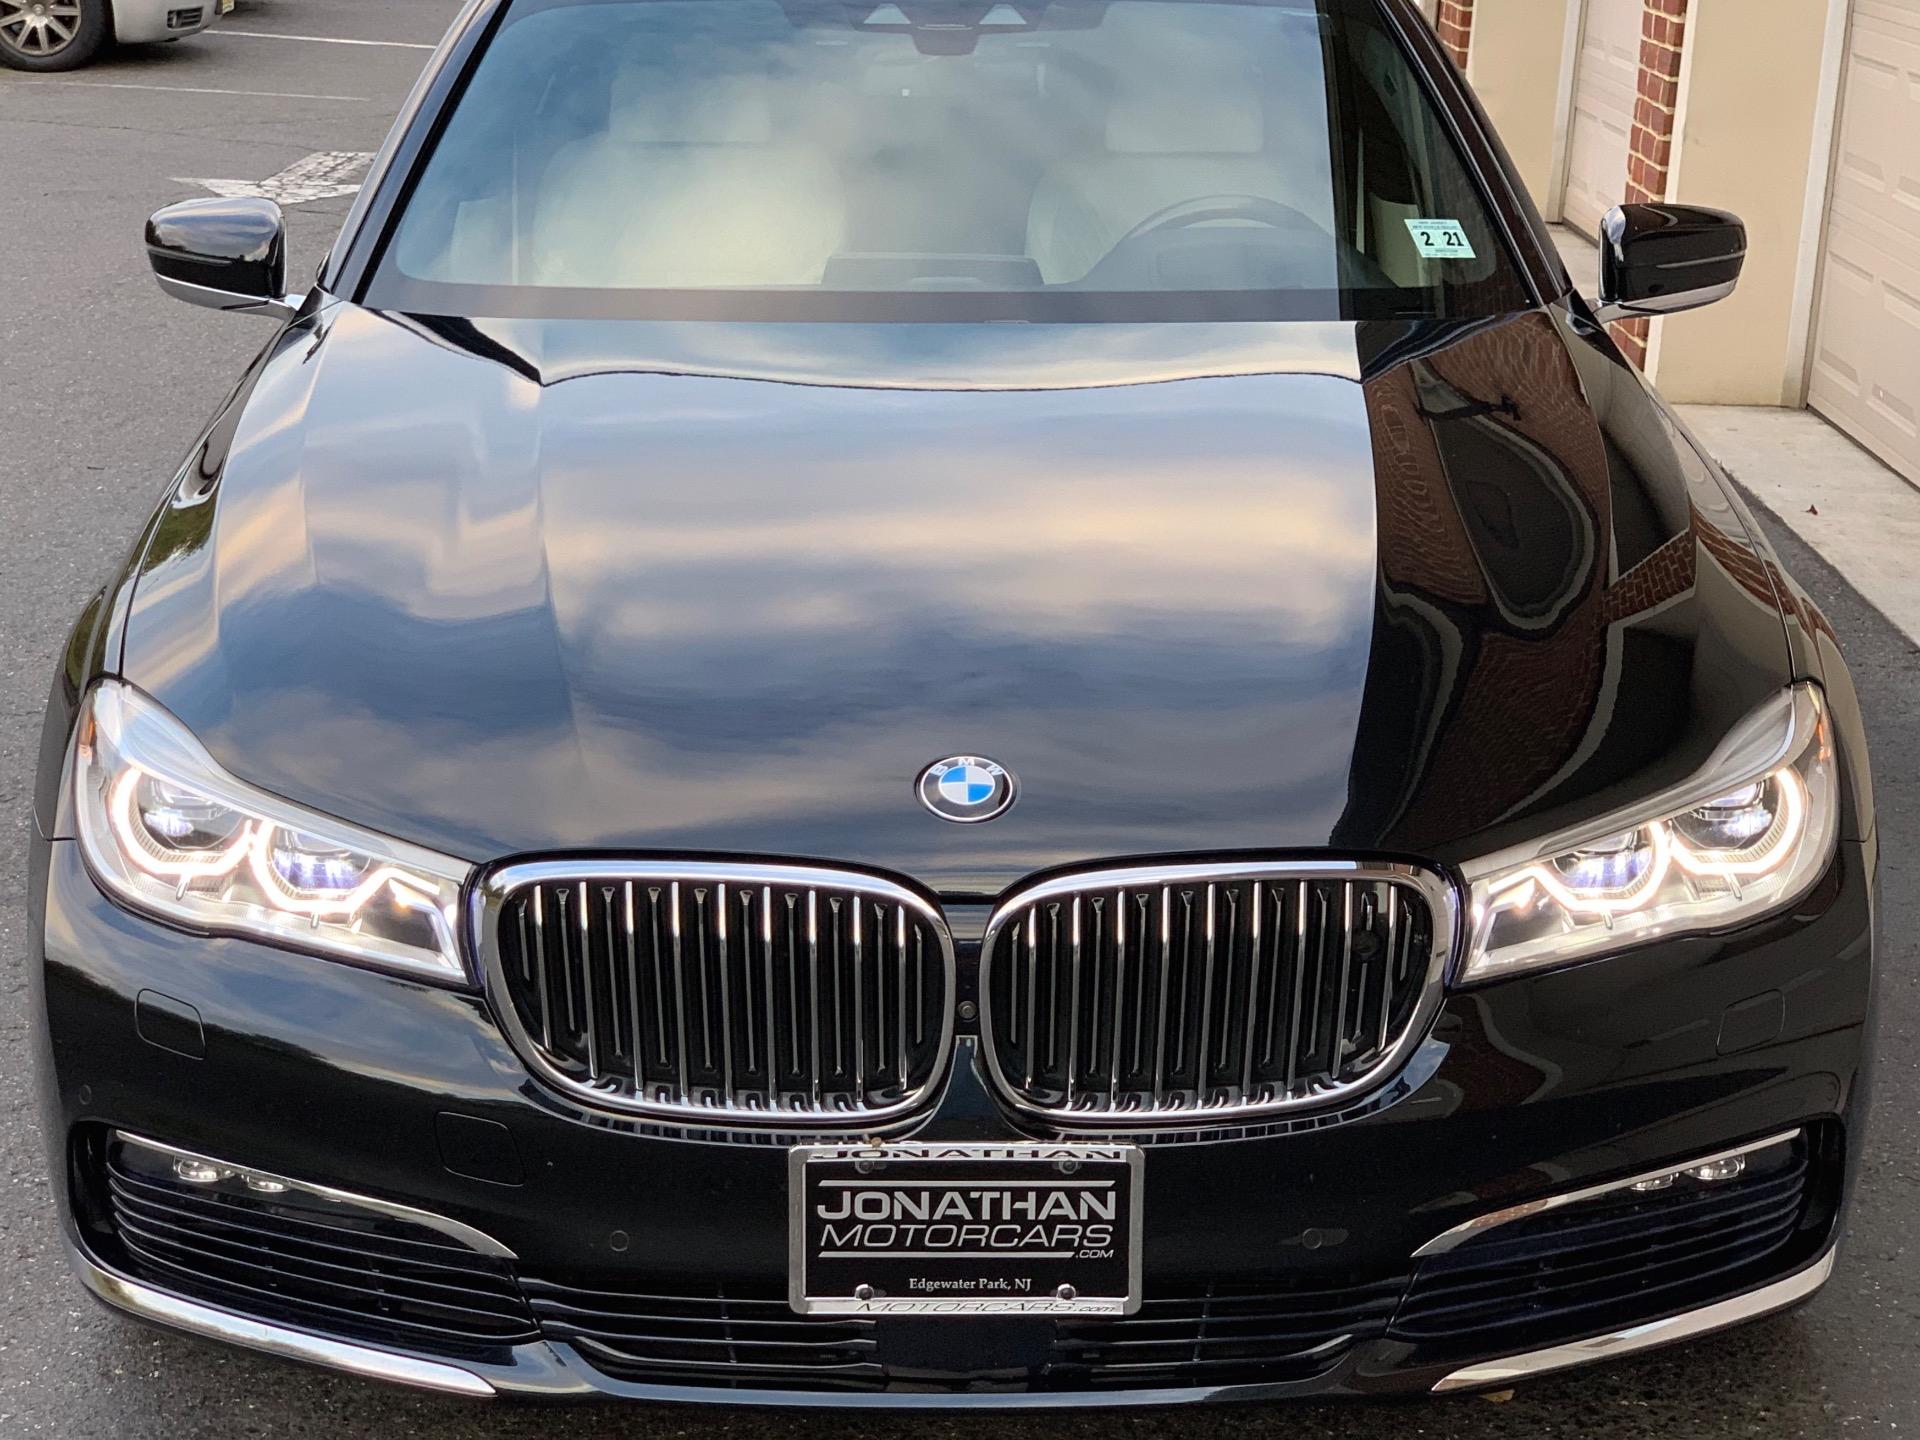 Used-2016-BMW-7-Series-750i-xDrive-Autobahn-Executive